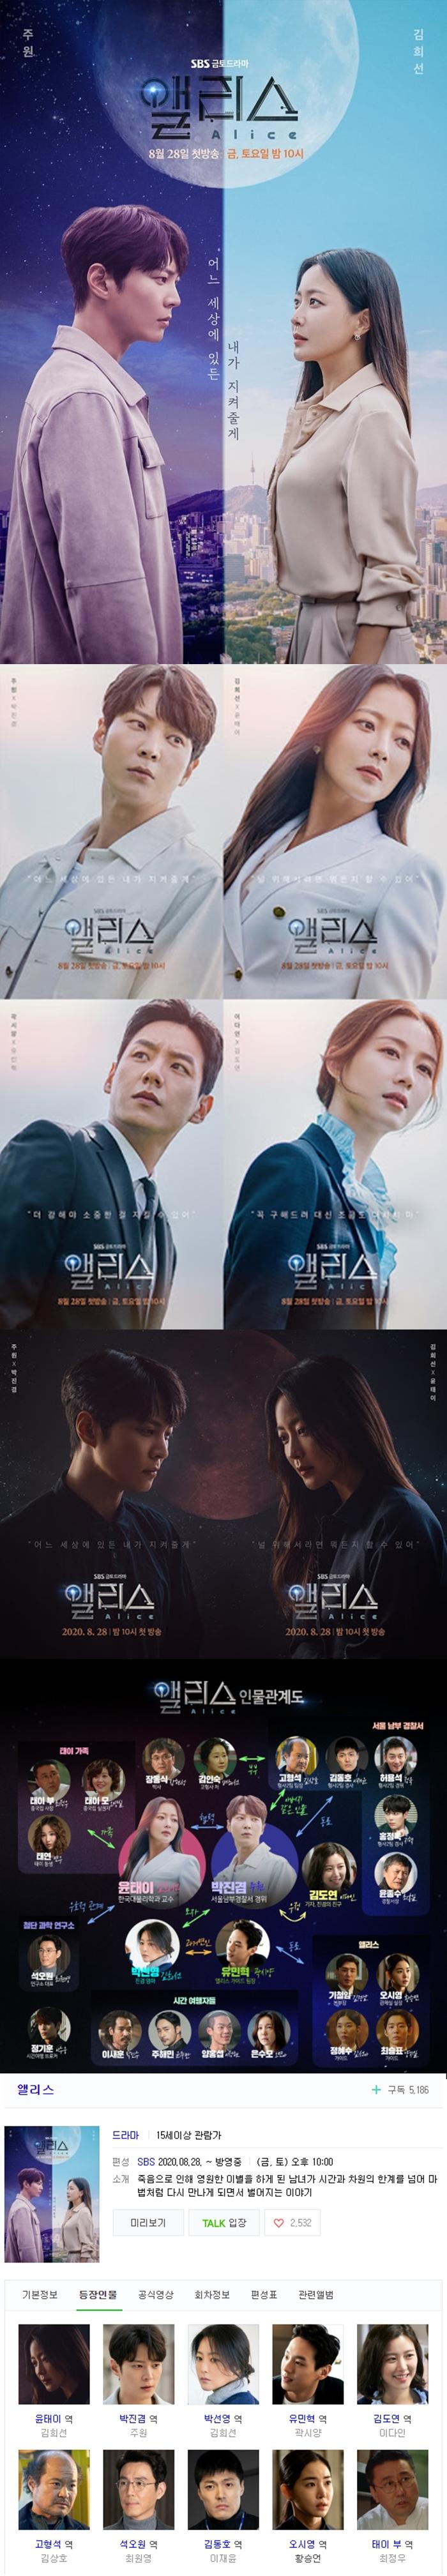 <b>앨리스  01화~16화  완결모음(720P) - 김희선,주원,곽시양,이다인</b>